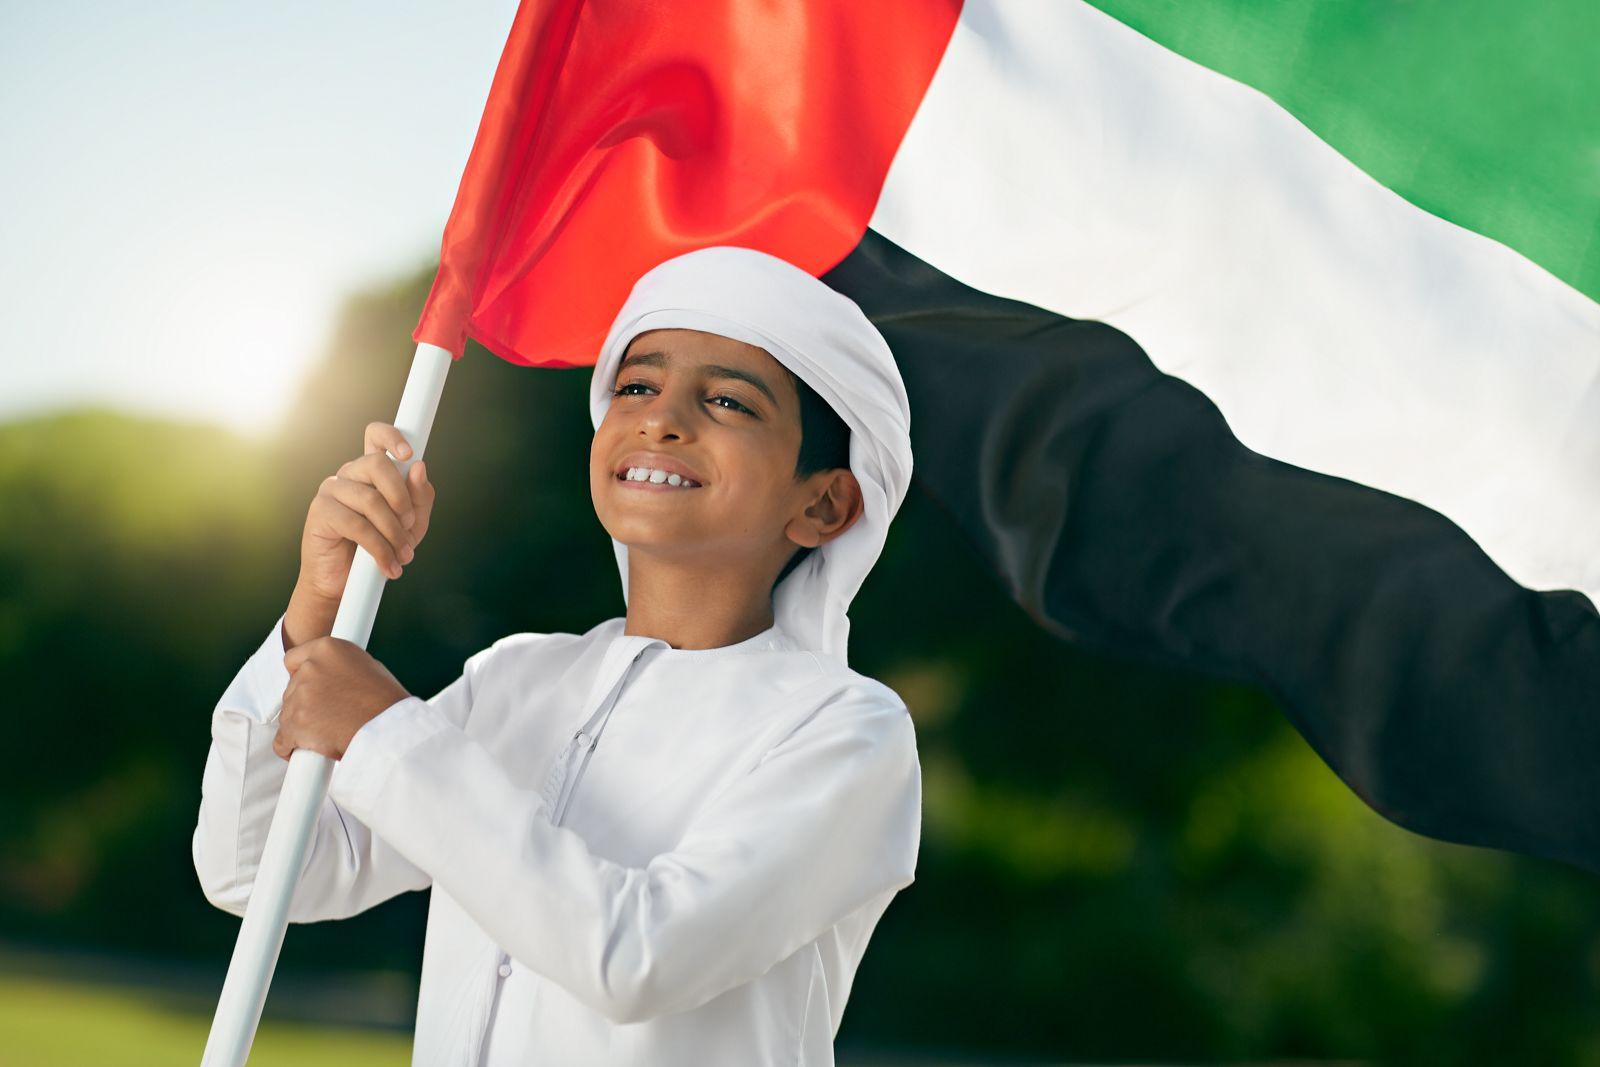 Abu Dhabi Lifestyle Photographer, Dubai Lifestyle Photographer, Saudi Arabia Advertising Photographer, Saudi Arabia Lifestyle Photographer-5.jpg